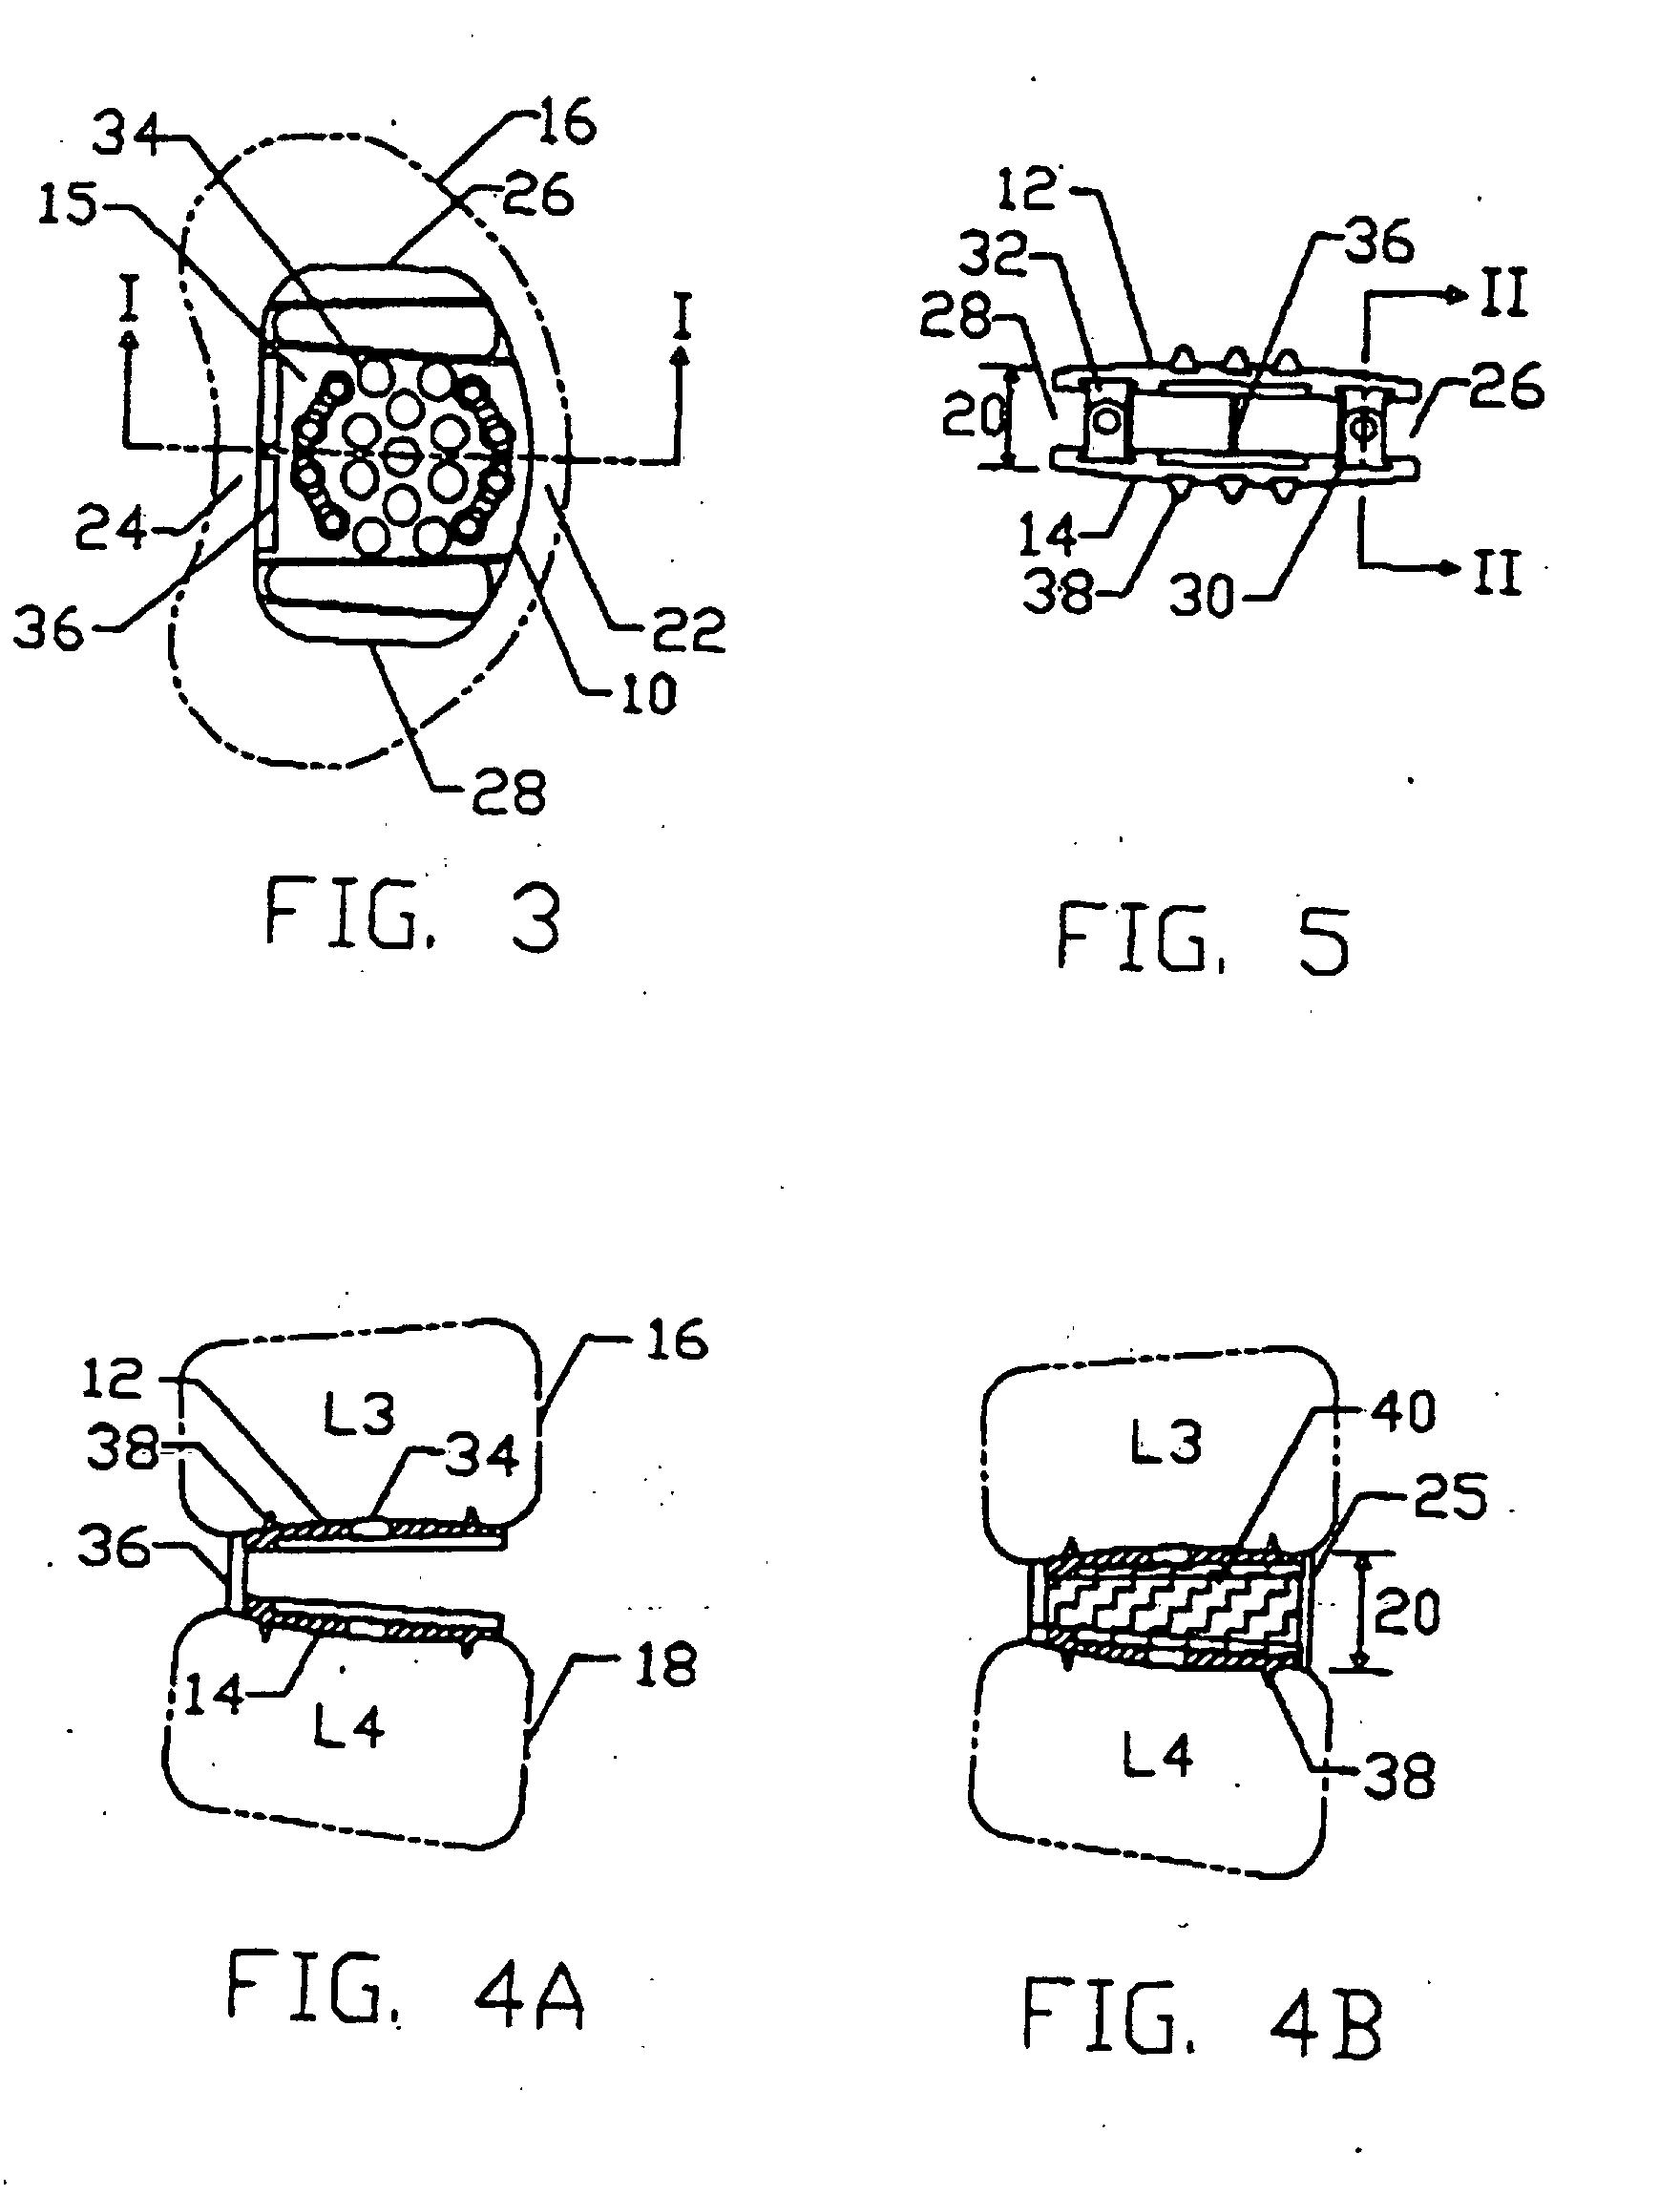 patent ep0977526b1 fusionsvorrichtung mit multivariabler h he google patentsuche. Black Bedroom Furniture Sets. Home Design Ideas